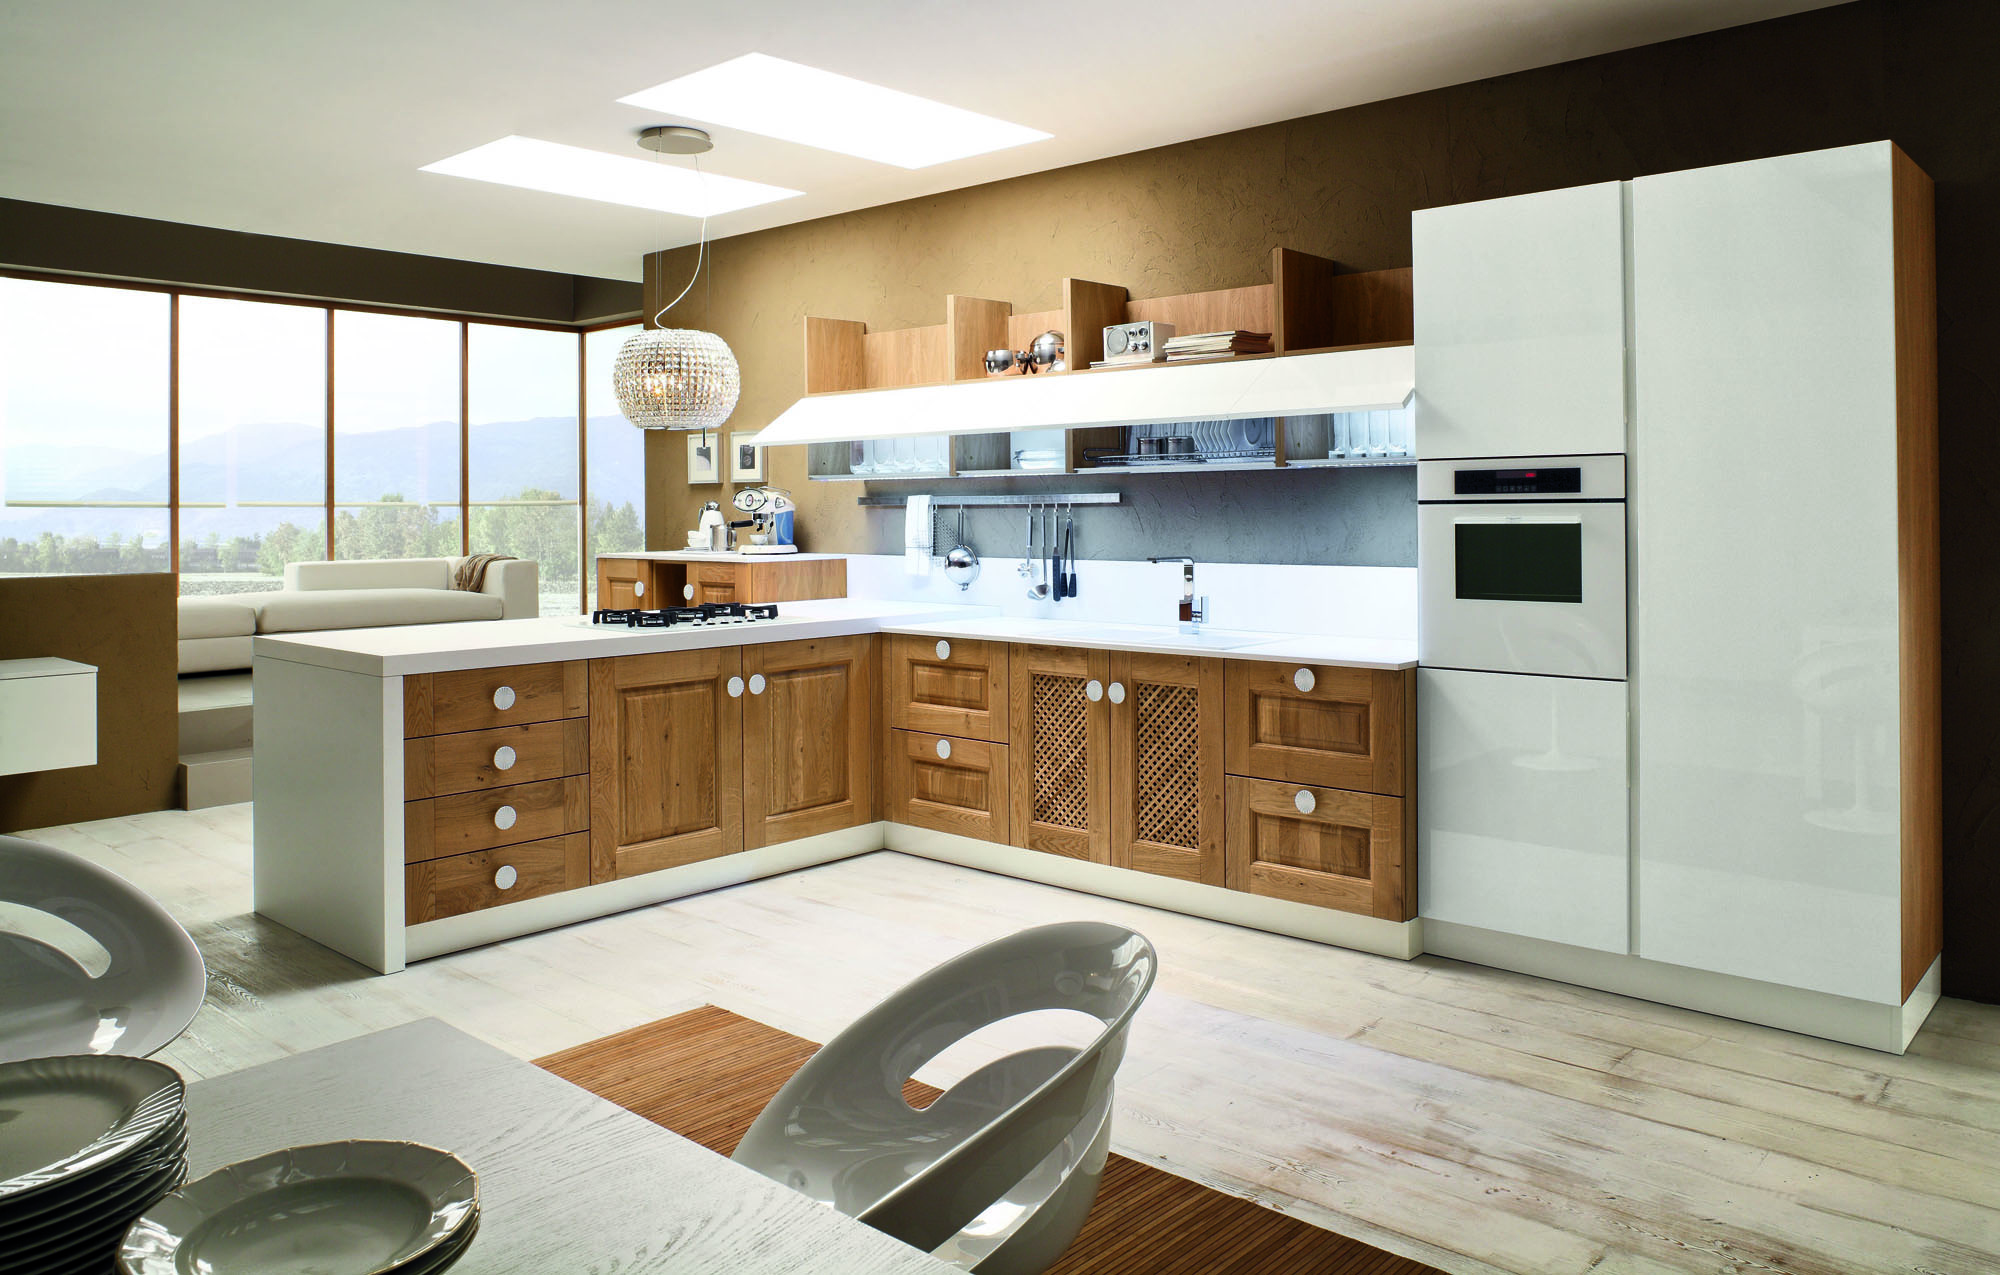 Cucine arrex deper mobili s r l - Arrex cucine catalogo ...